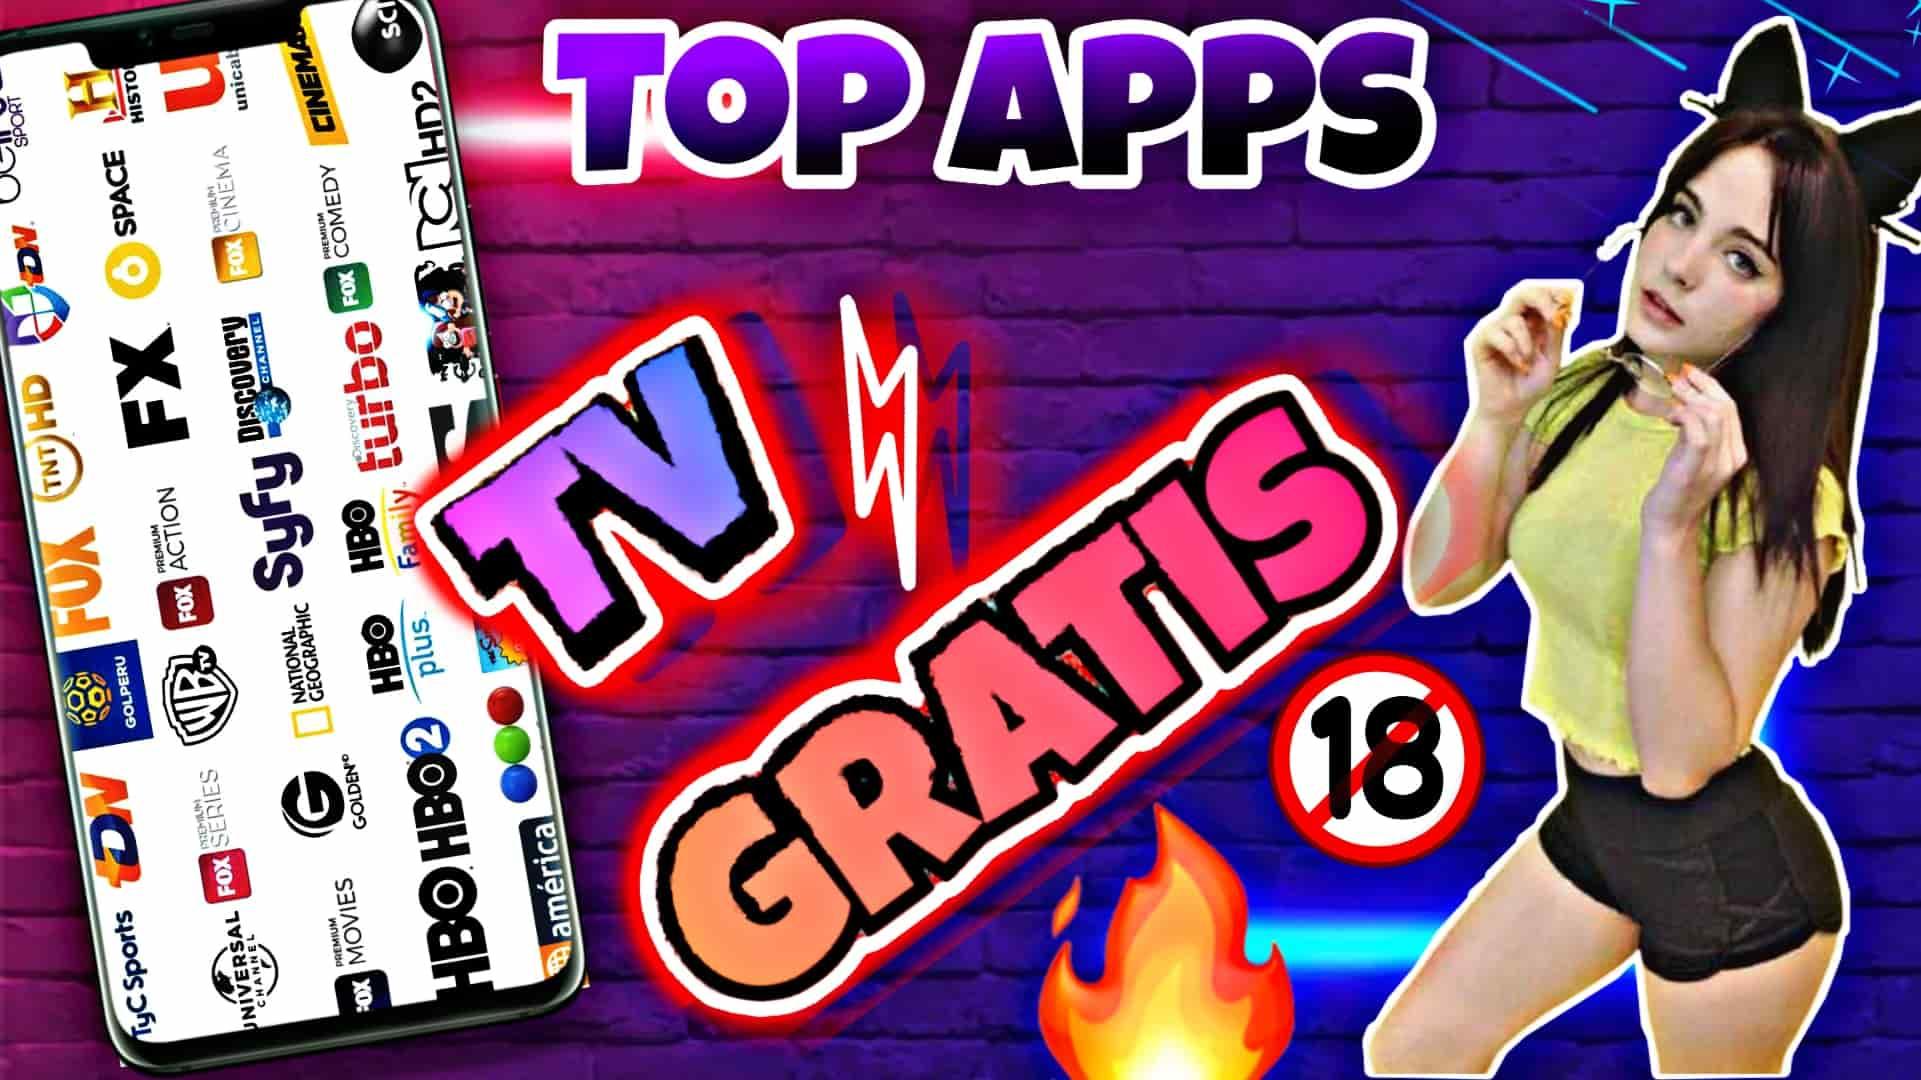 top apps para ver tv premium gratis en Android 2020